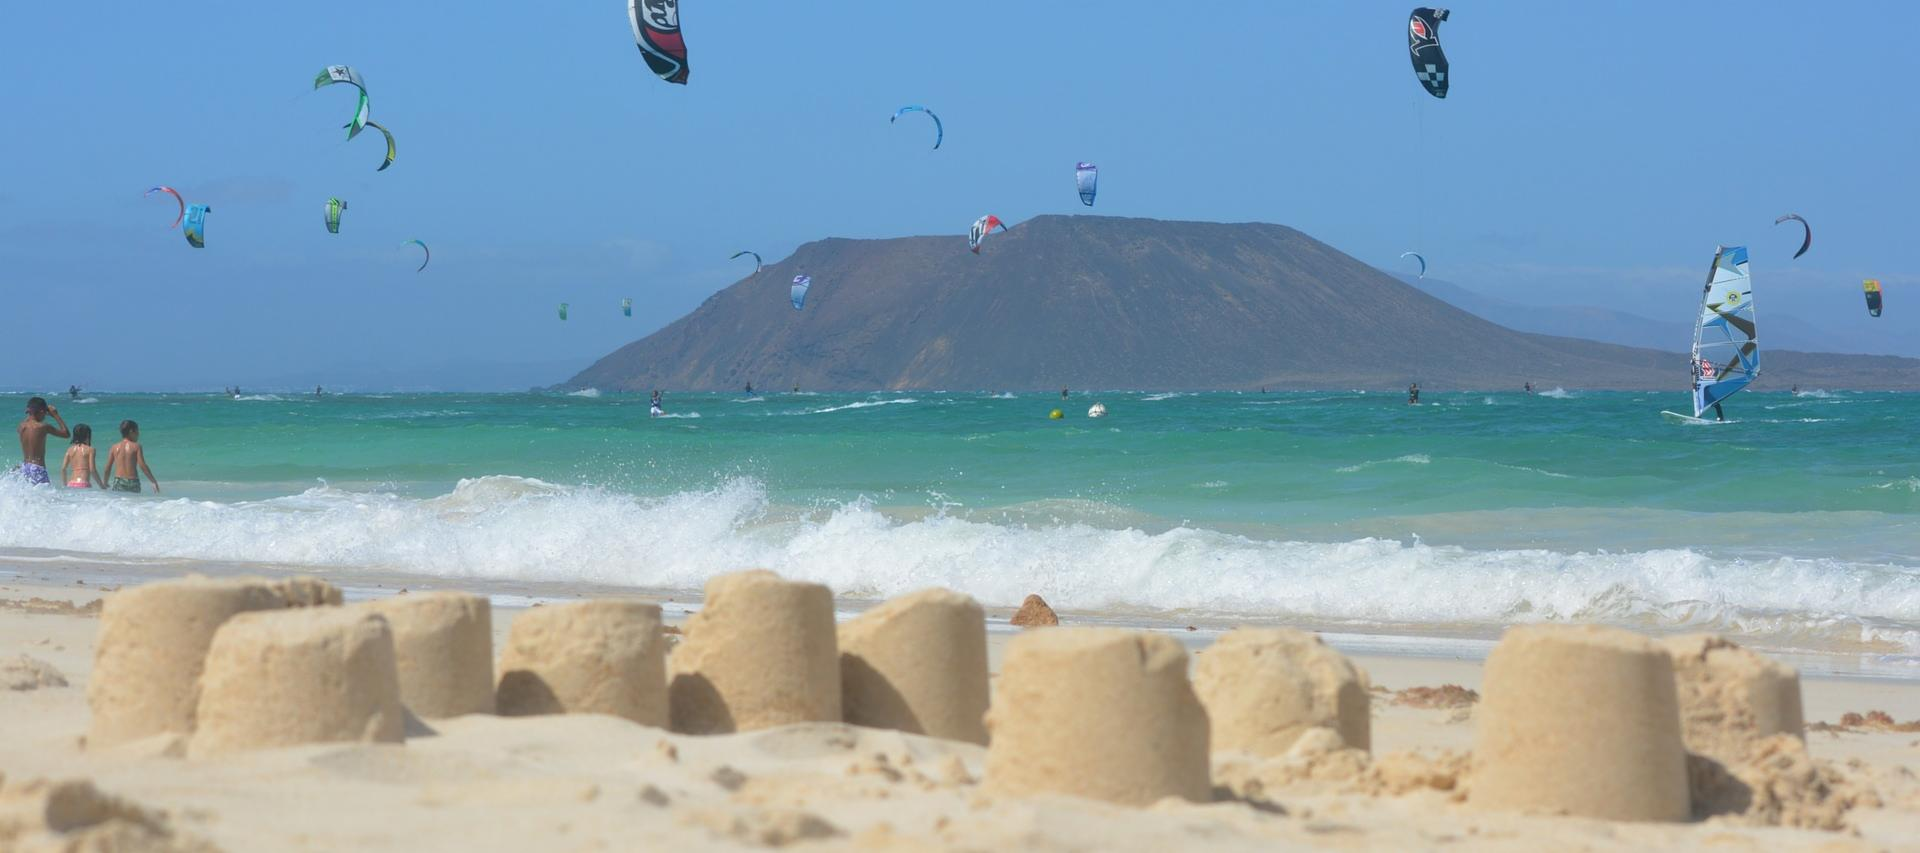 Isla de Lobos, Fuerteventura | Your Guide to Fuerteventura